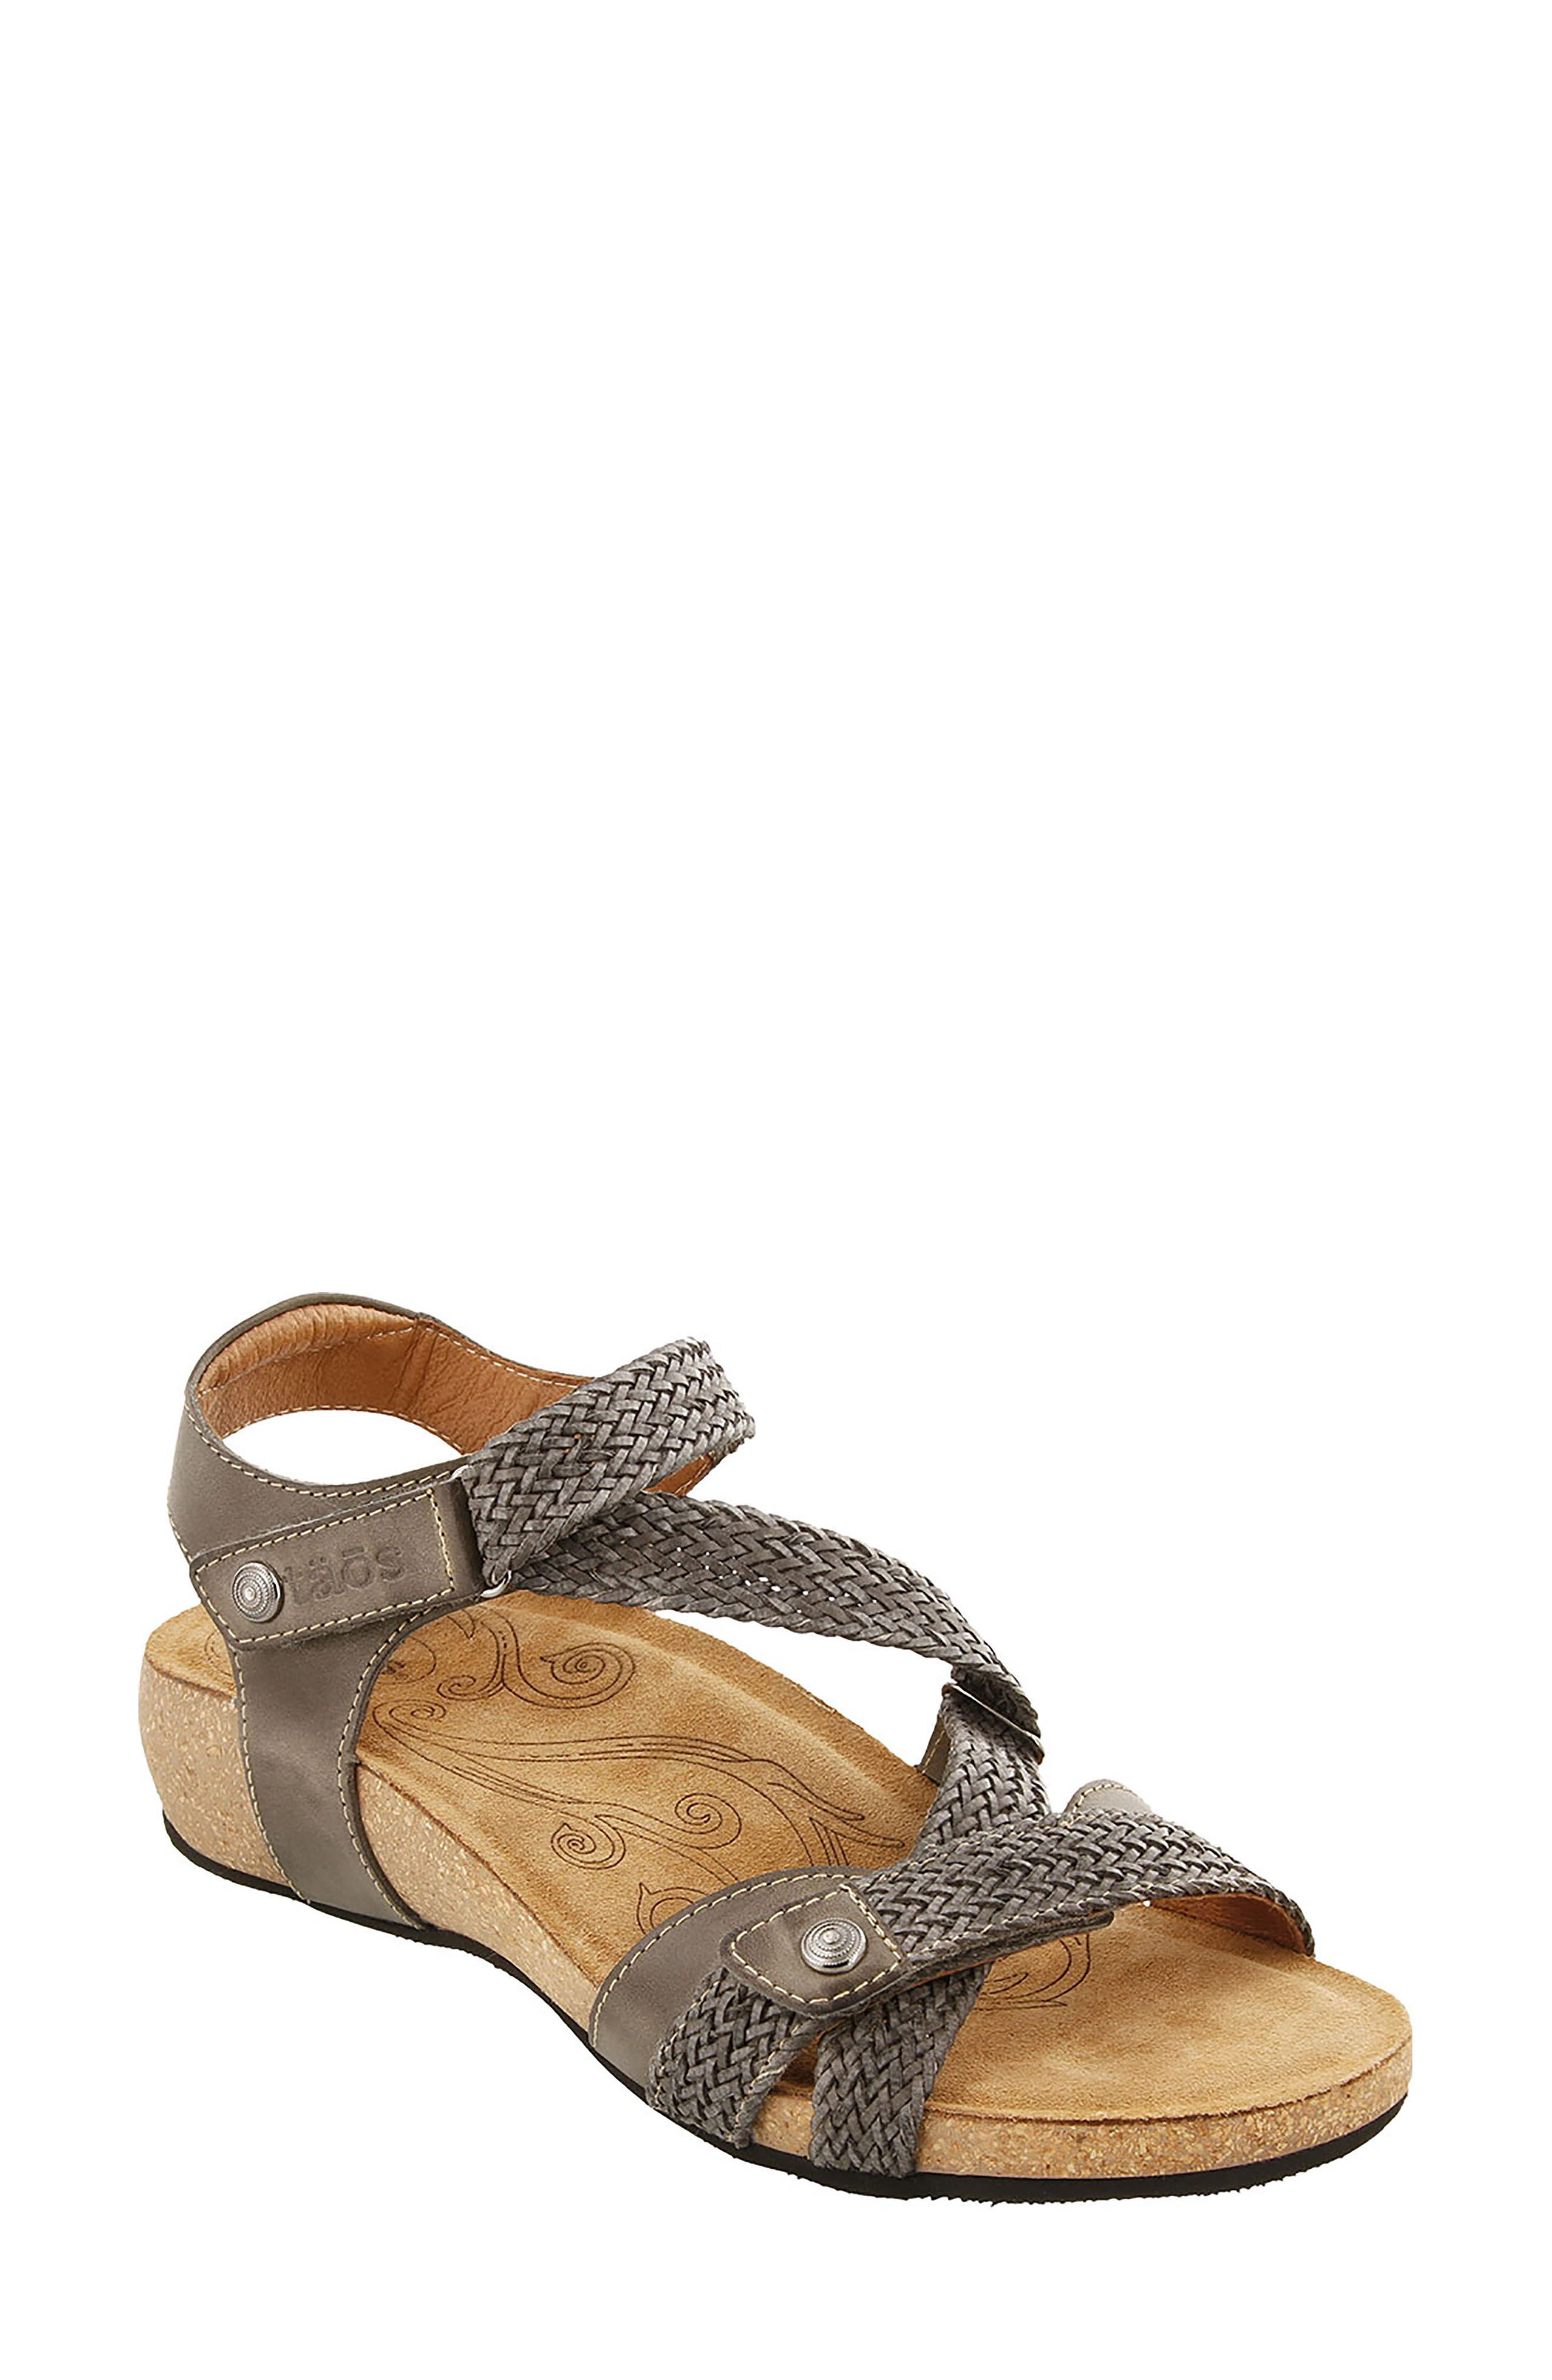 TAOS 'Trulie' Wedge Sandal, Main, color, 022